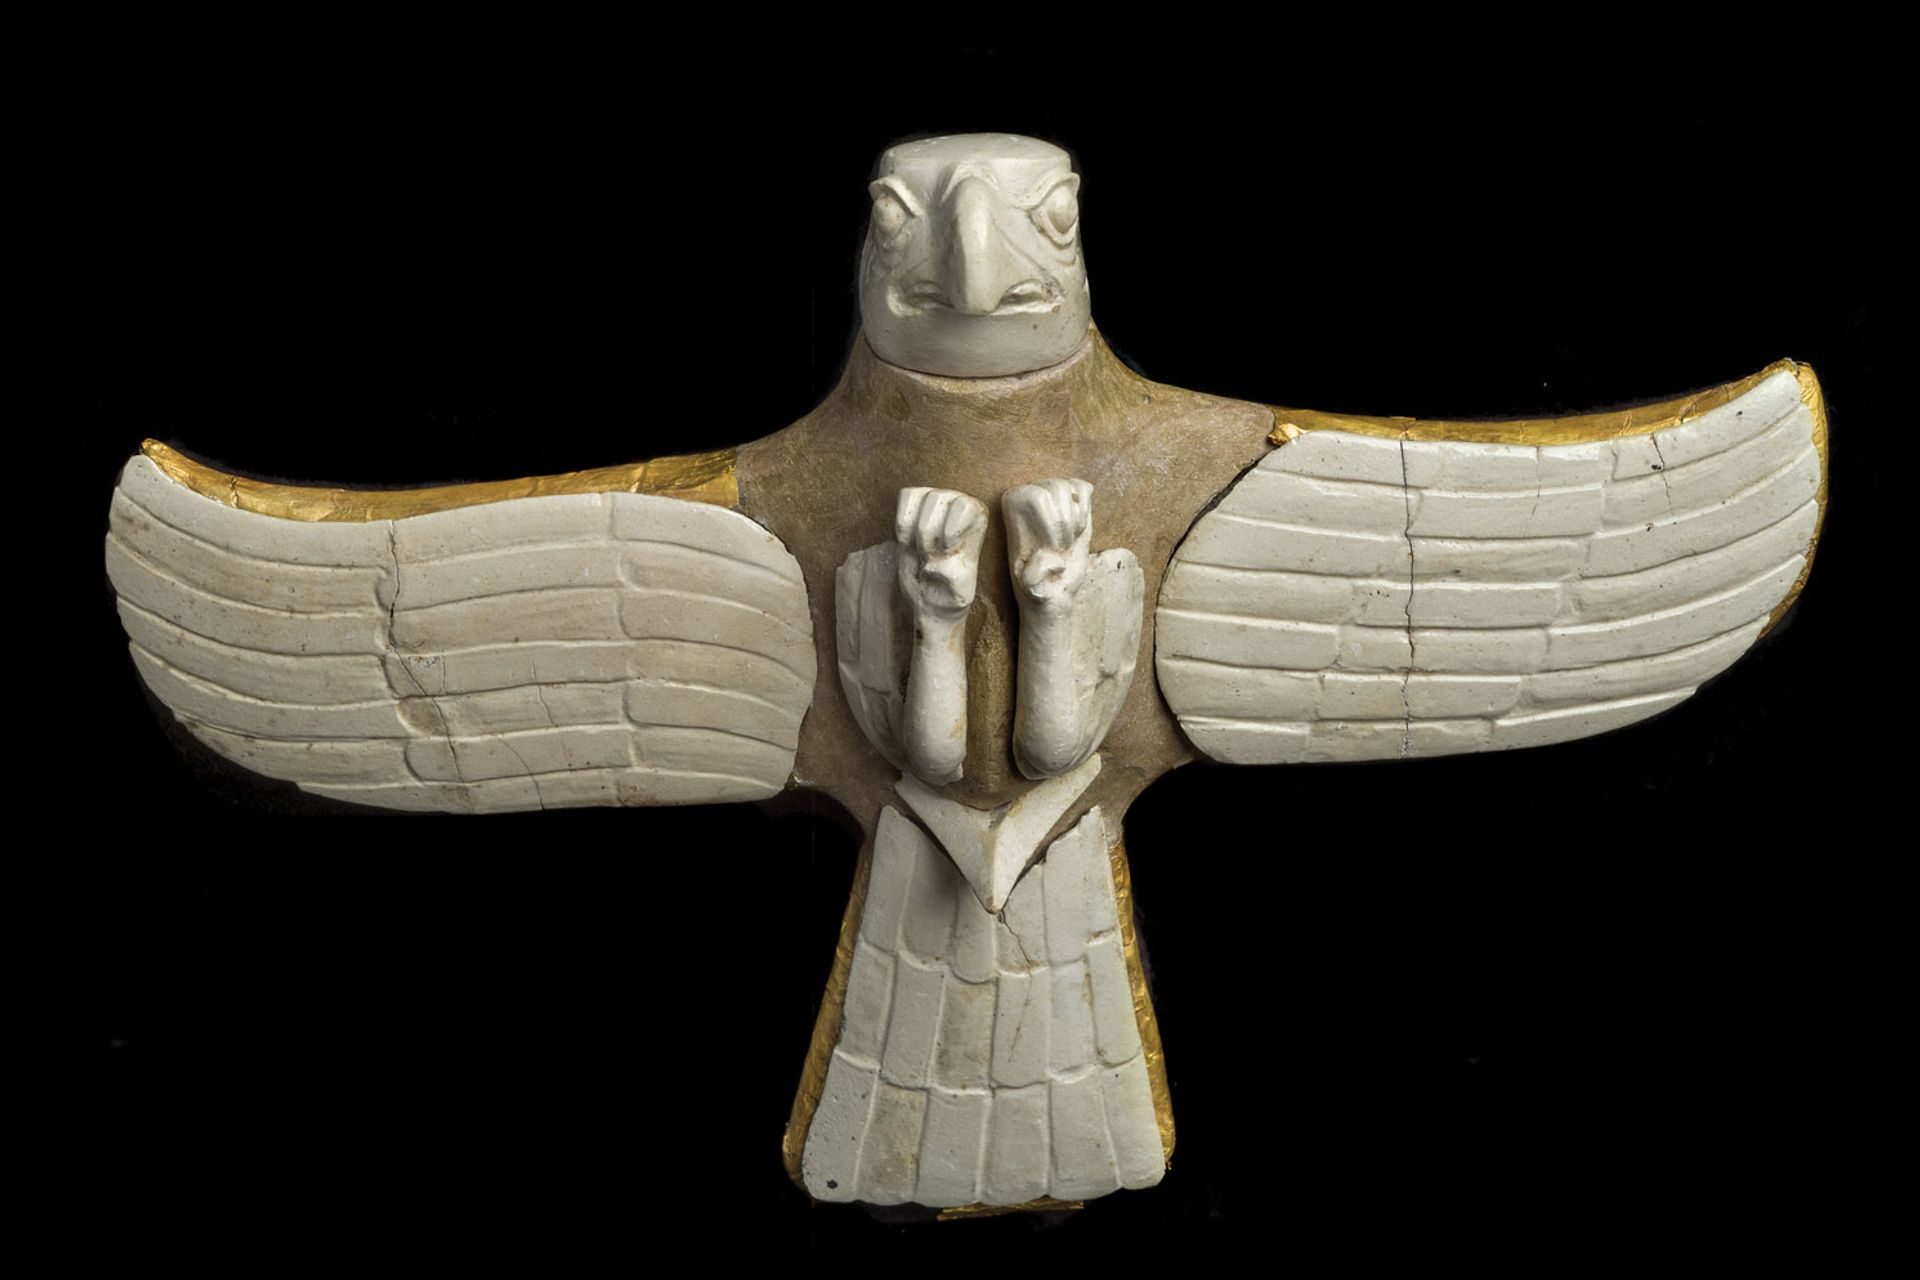 A Bronze Age bird of prey figure from the royal necropolis at Gonur Tepe State Museum of Turkmenistan, Ashgabat; © Staatliche Museen zu Berlin